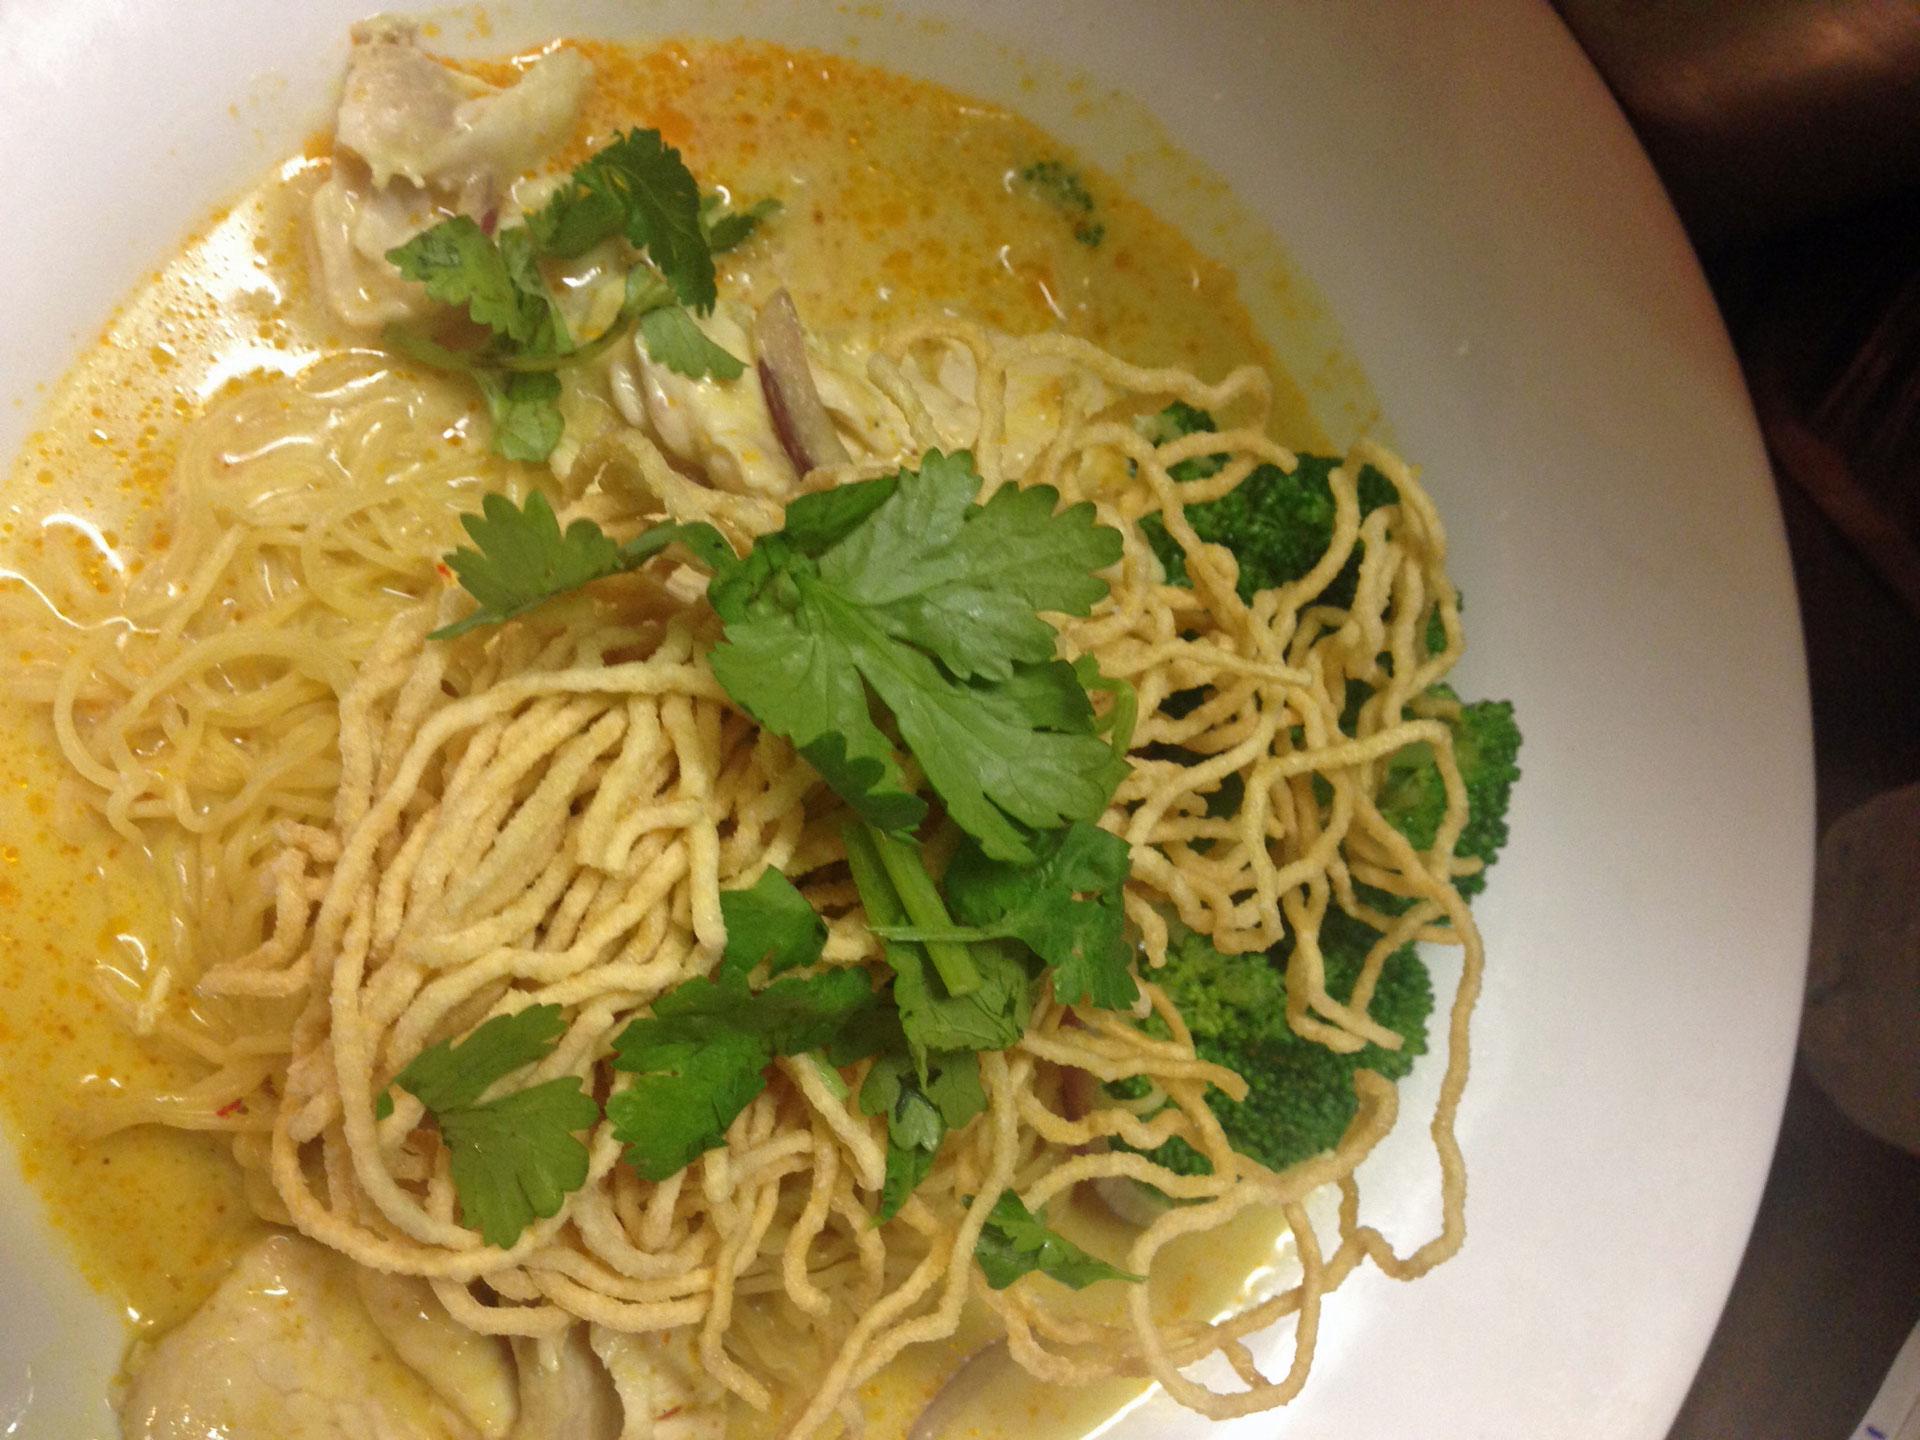 Home tree top thai cuisine waltham thai food thai for At home thai cuisine